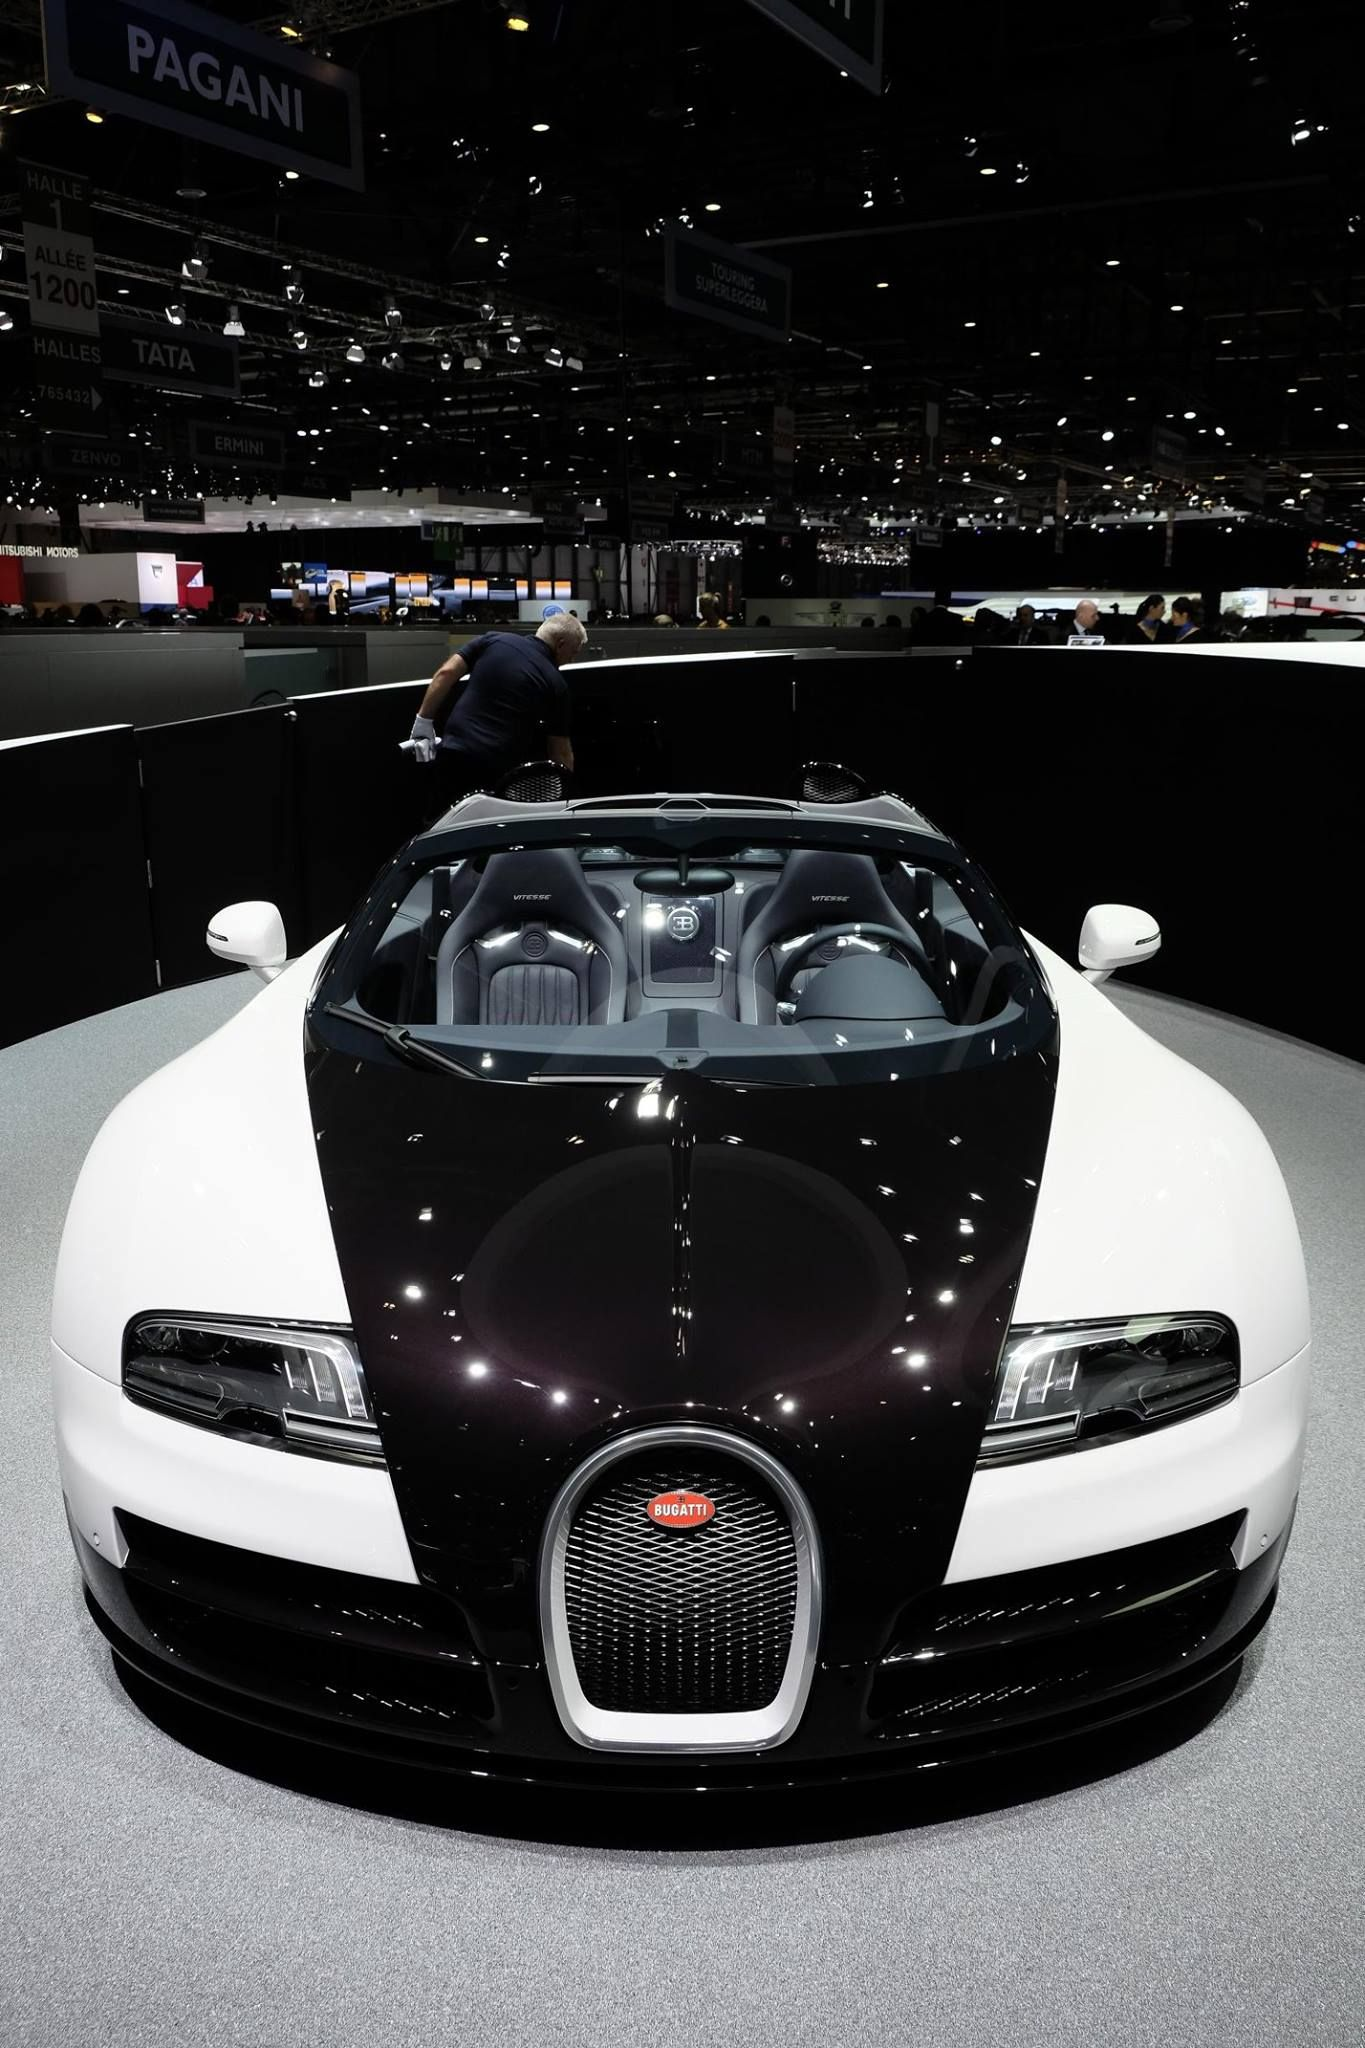 5a871dfad0057fcb2e428f4263cee7ff Wonderful Bugatti Veyron Grand Sport Vitesse Mansory Vivere 2014 Cars Trend